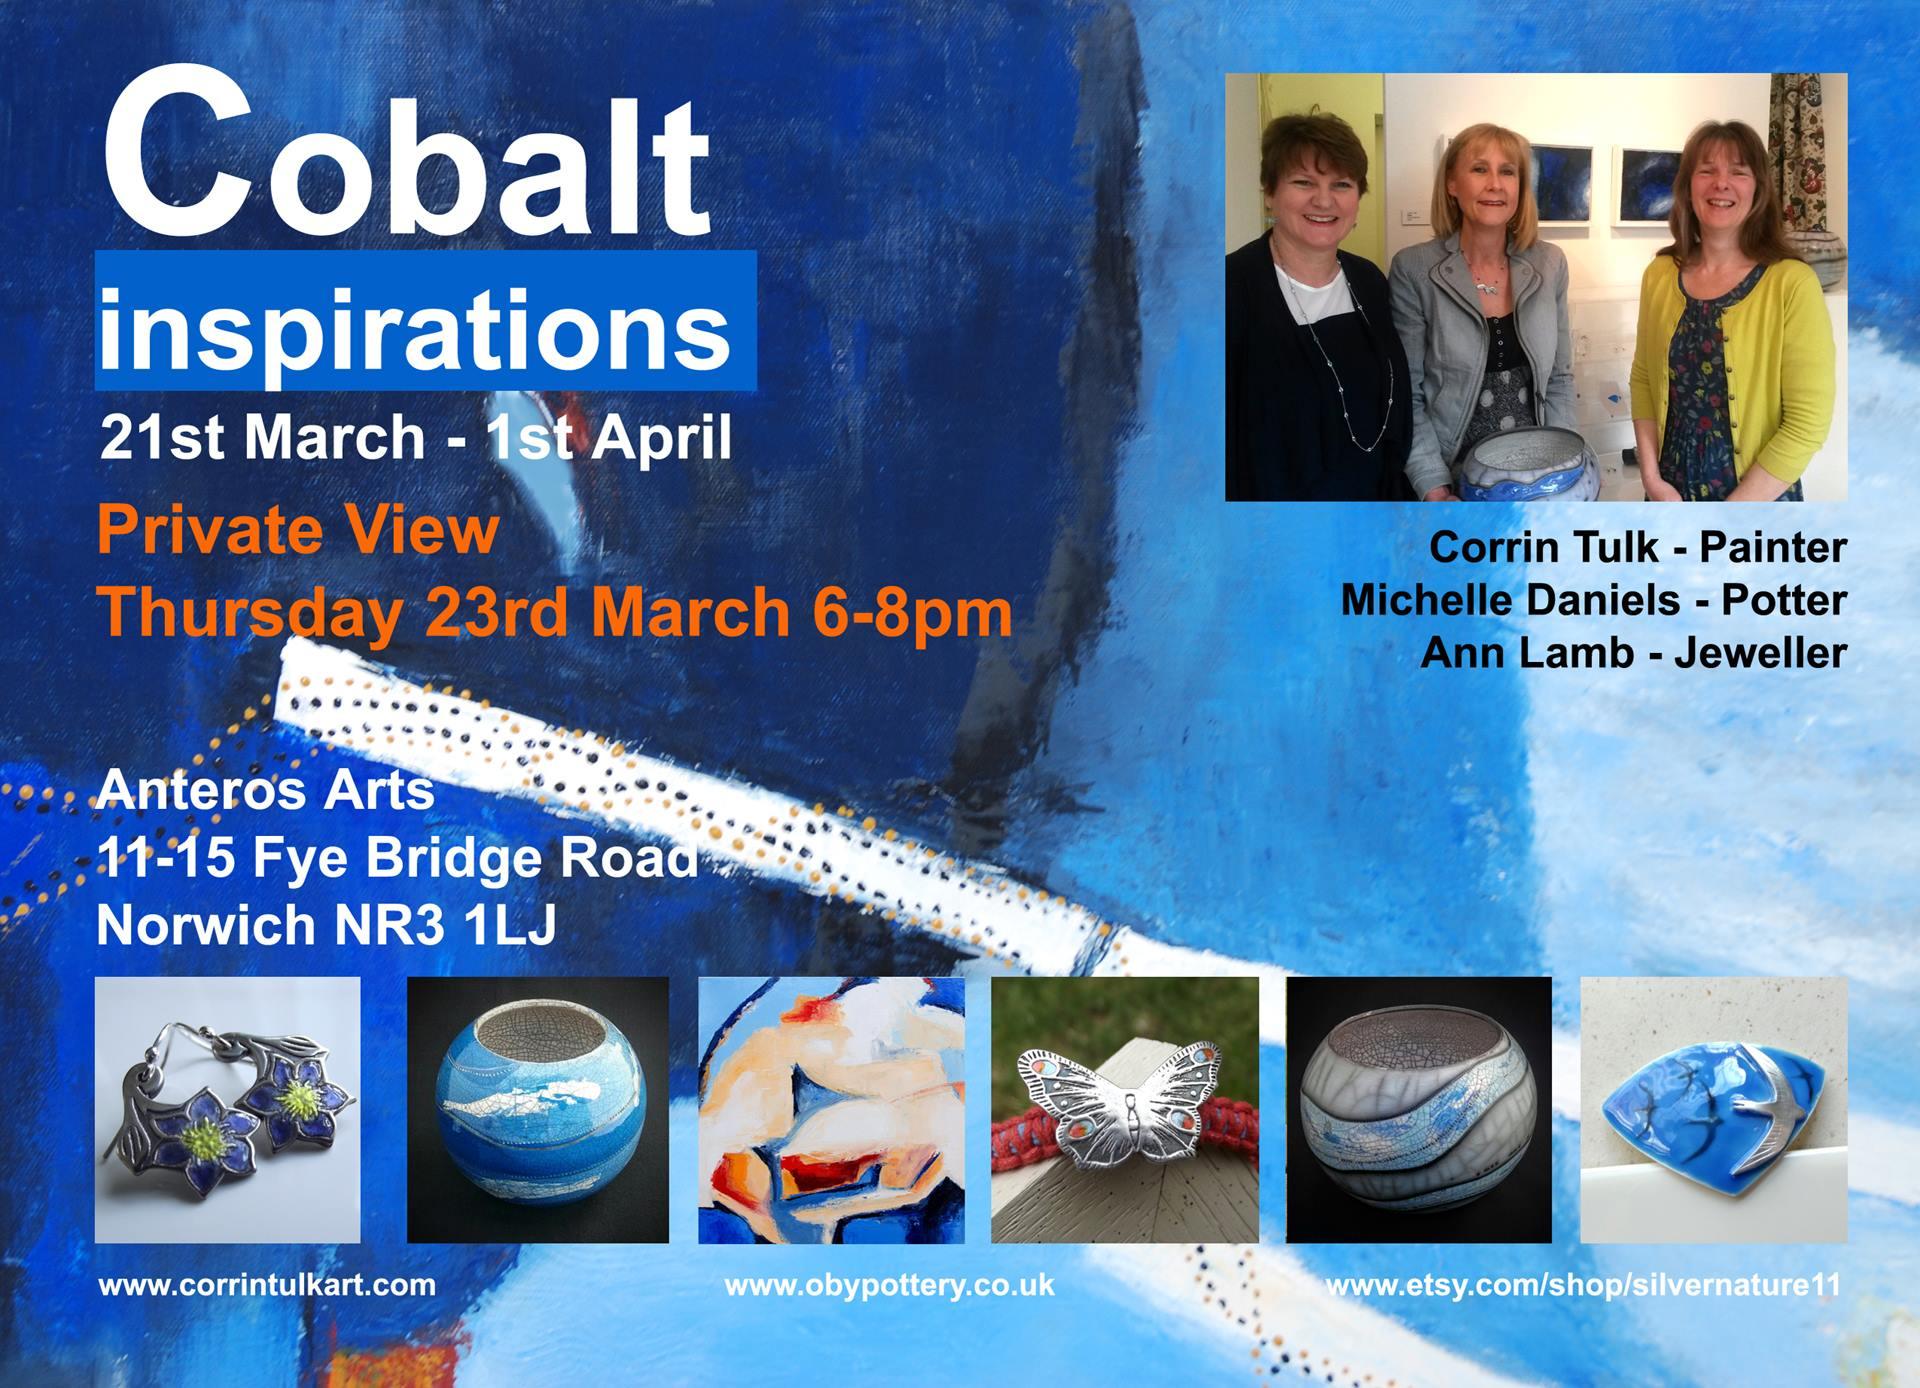 Cobalt Inspirations, Corrin Tulk, Michelle Daniels, Ann Lamb, Anteros Arts, Norwich